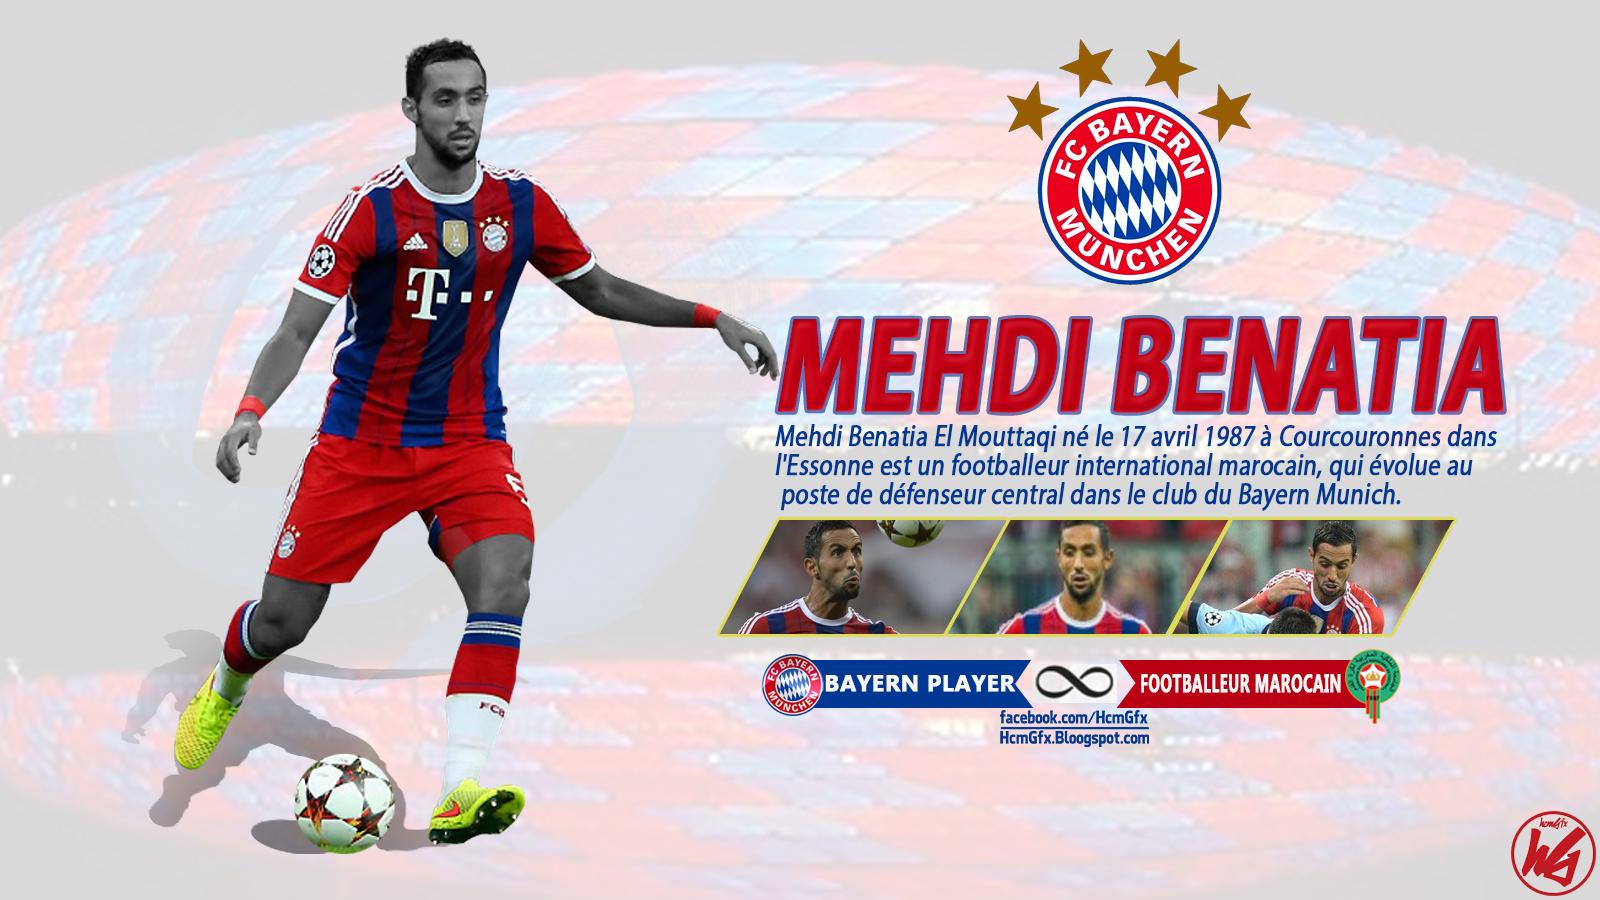 Mehdi Benatia 5 by hichamhcm on DeviantArt